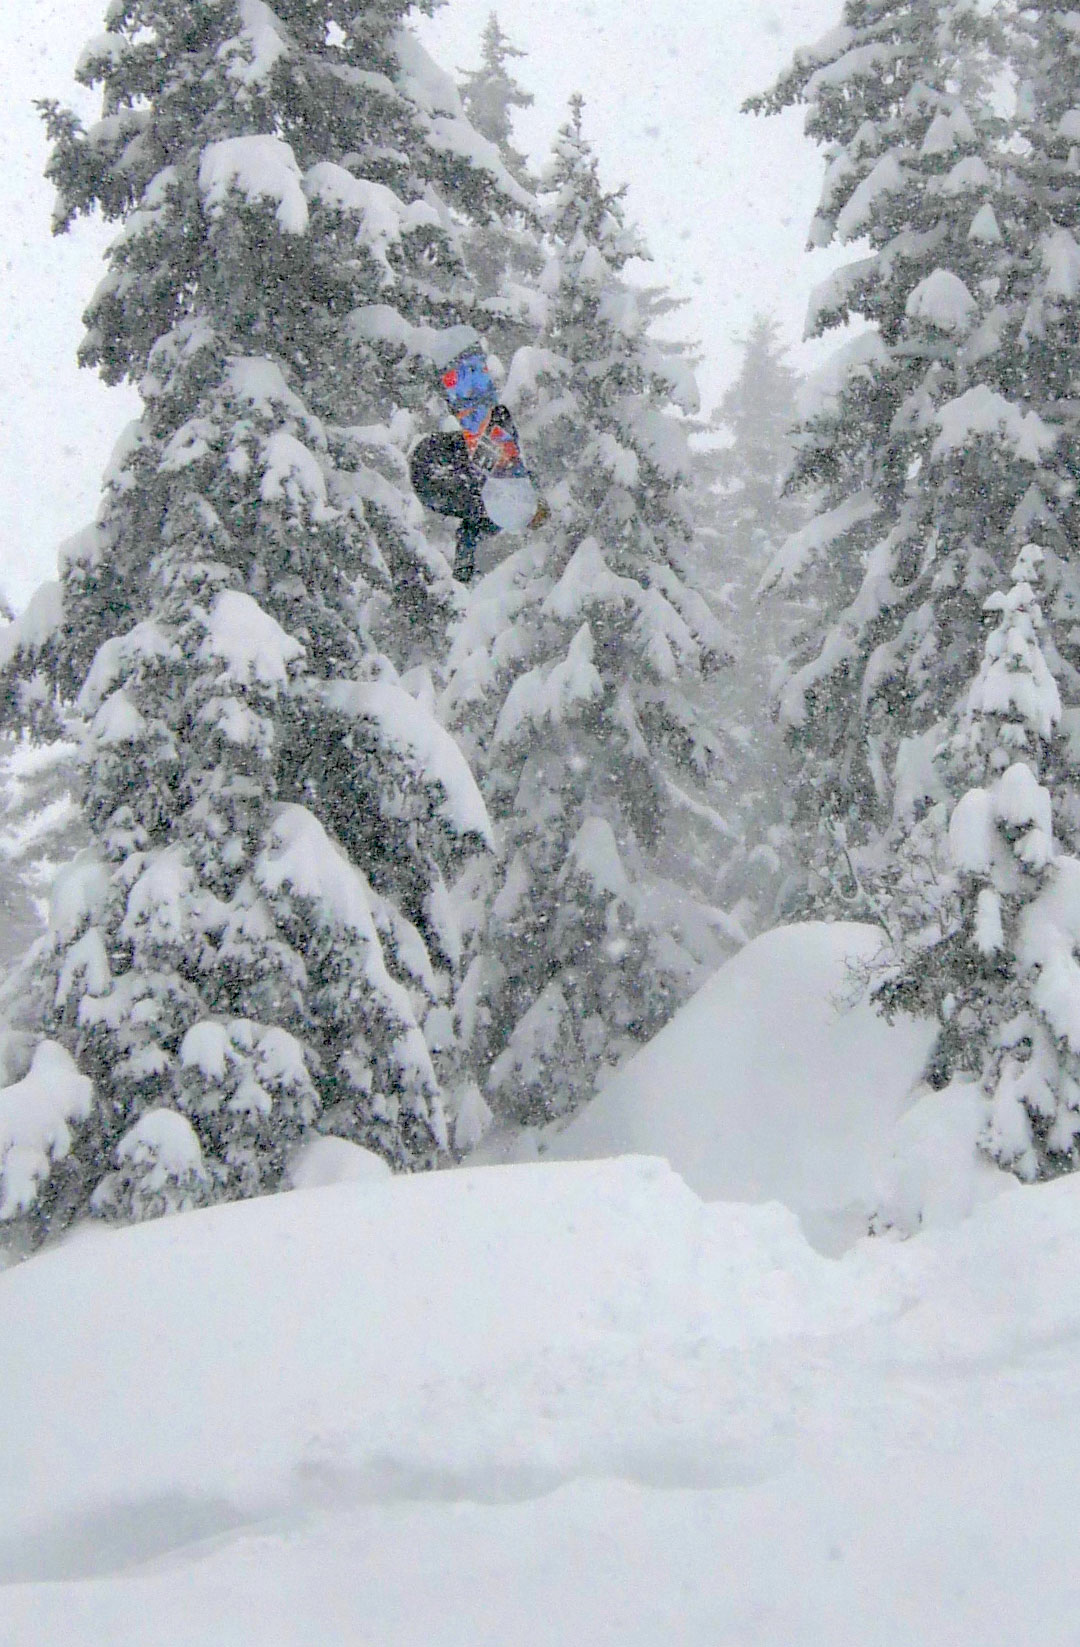 Prime-Snowboarding-Magazine-Libtech-Valerian-1